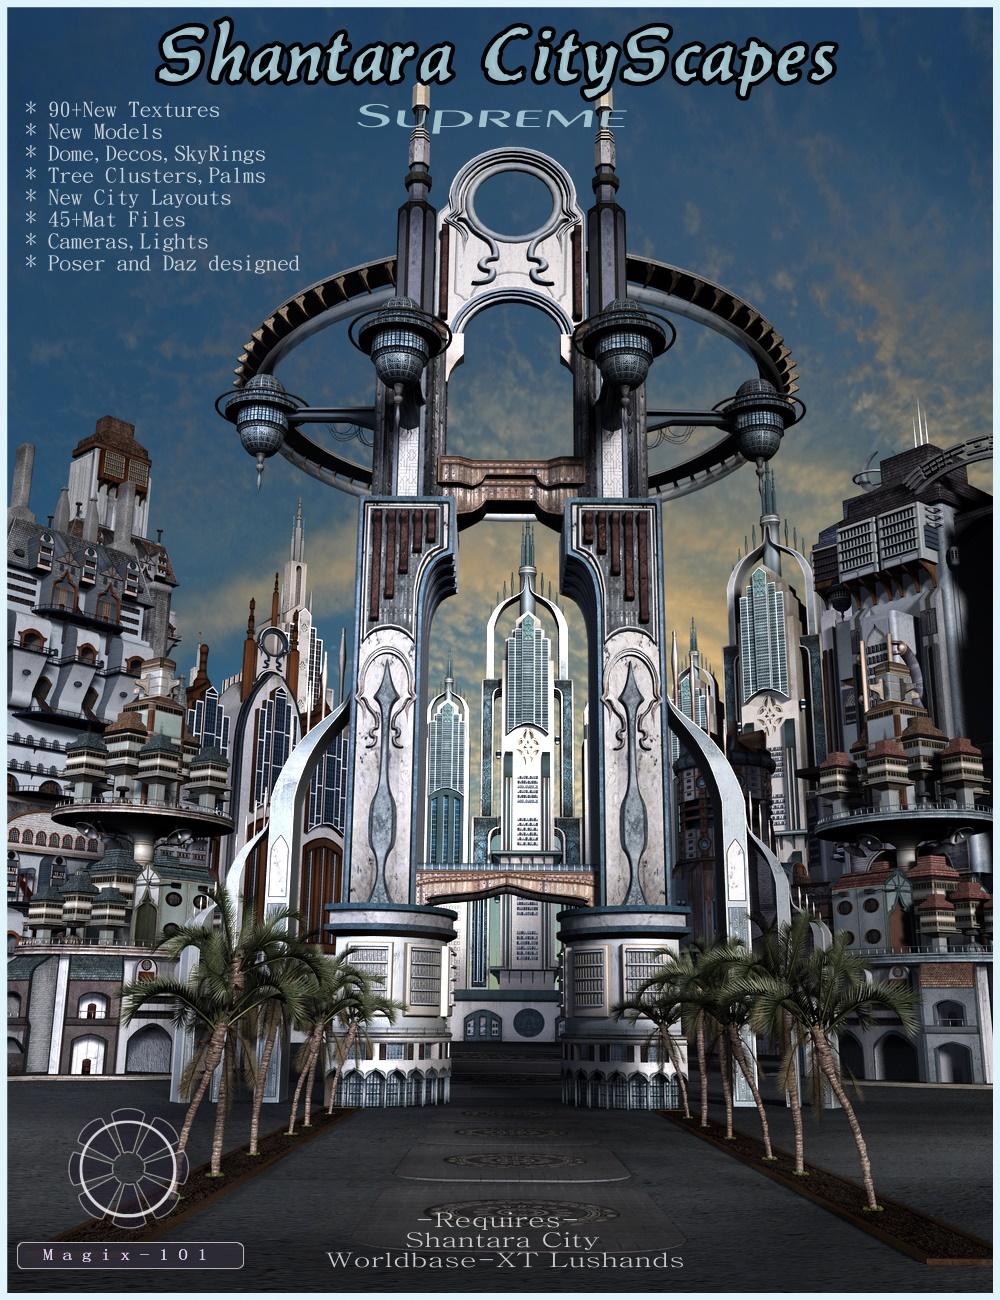 Shantara CityScapes Supreme by: Magix 101, 3D Models by Daz 3D